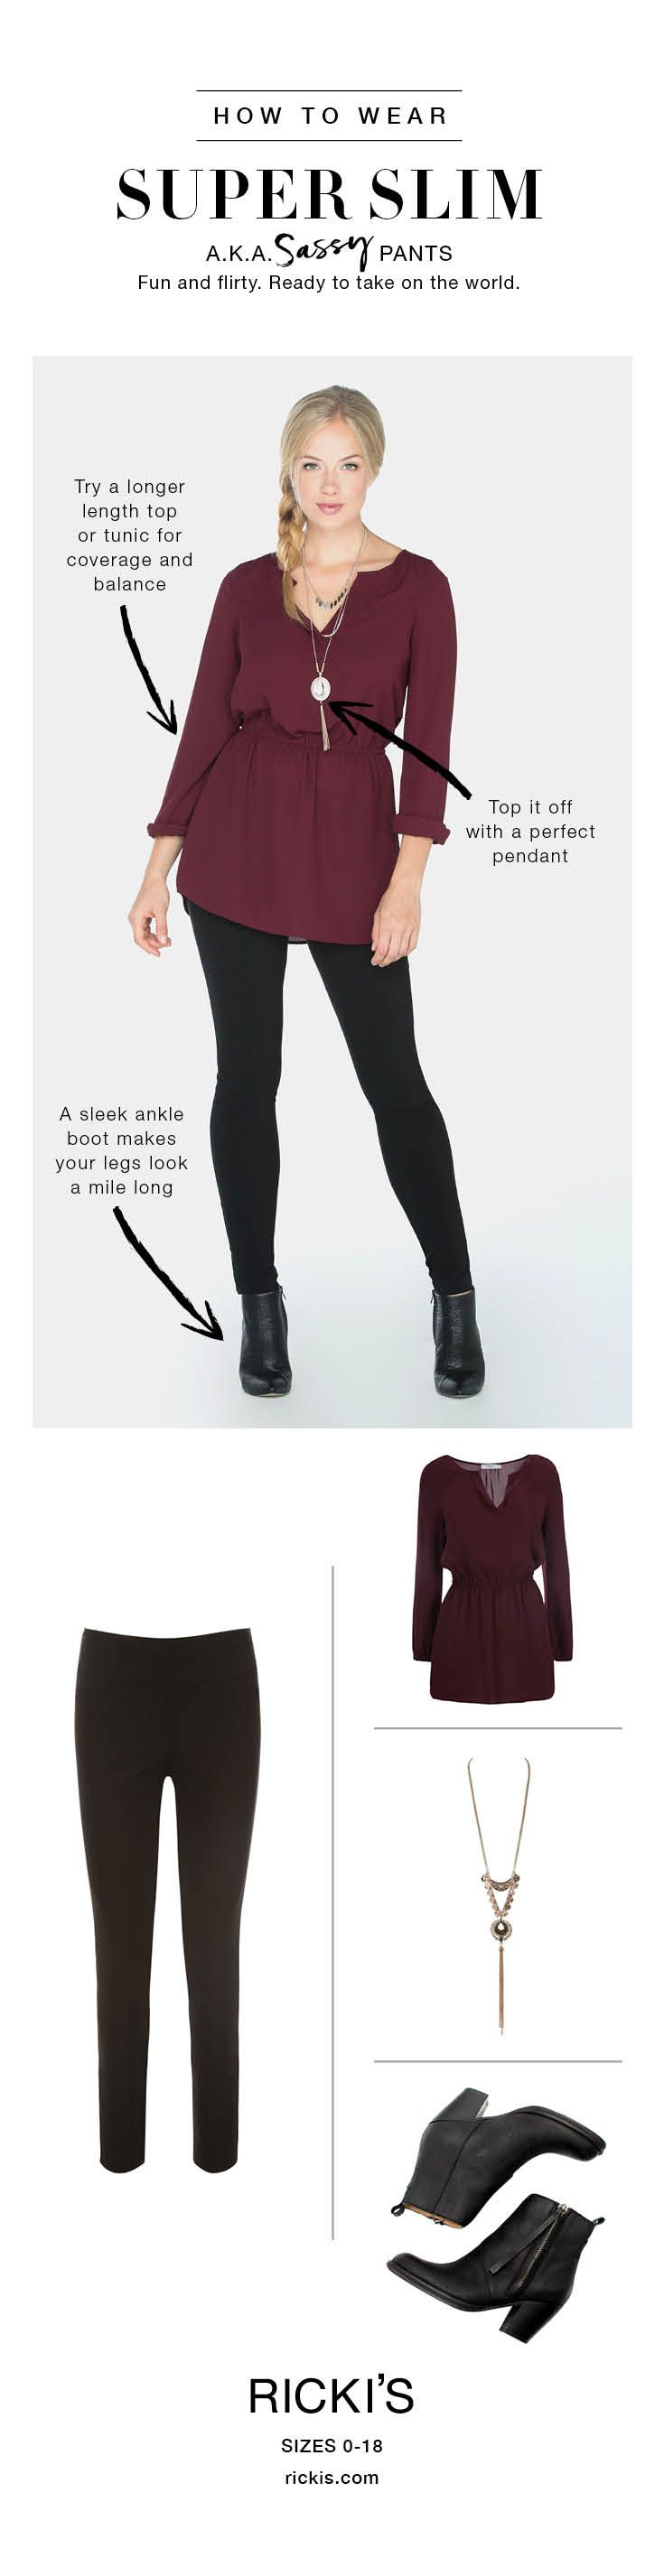 How to wear Ricki's Super Slim pants #rickis #loverickis #rickisfashion #fall…